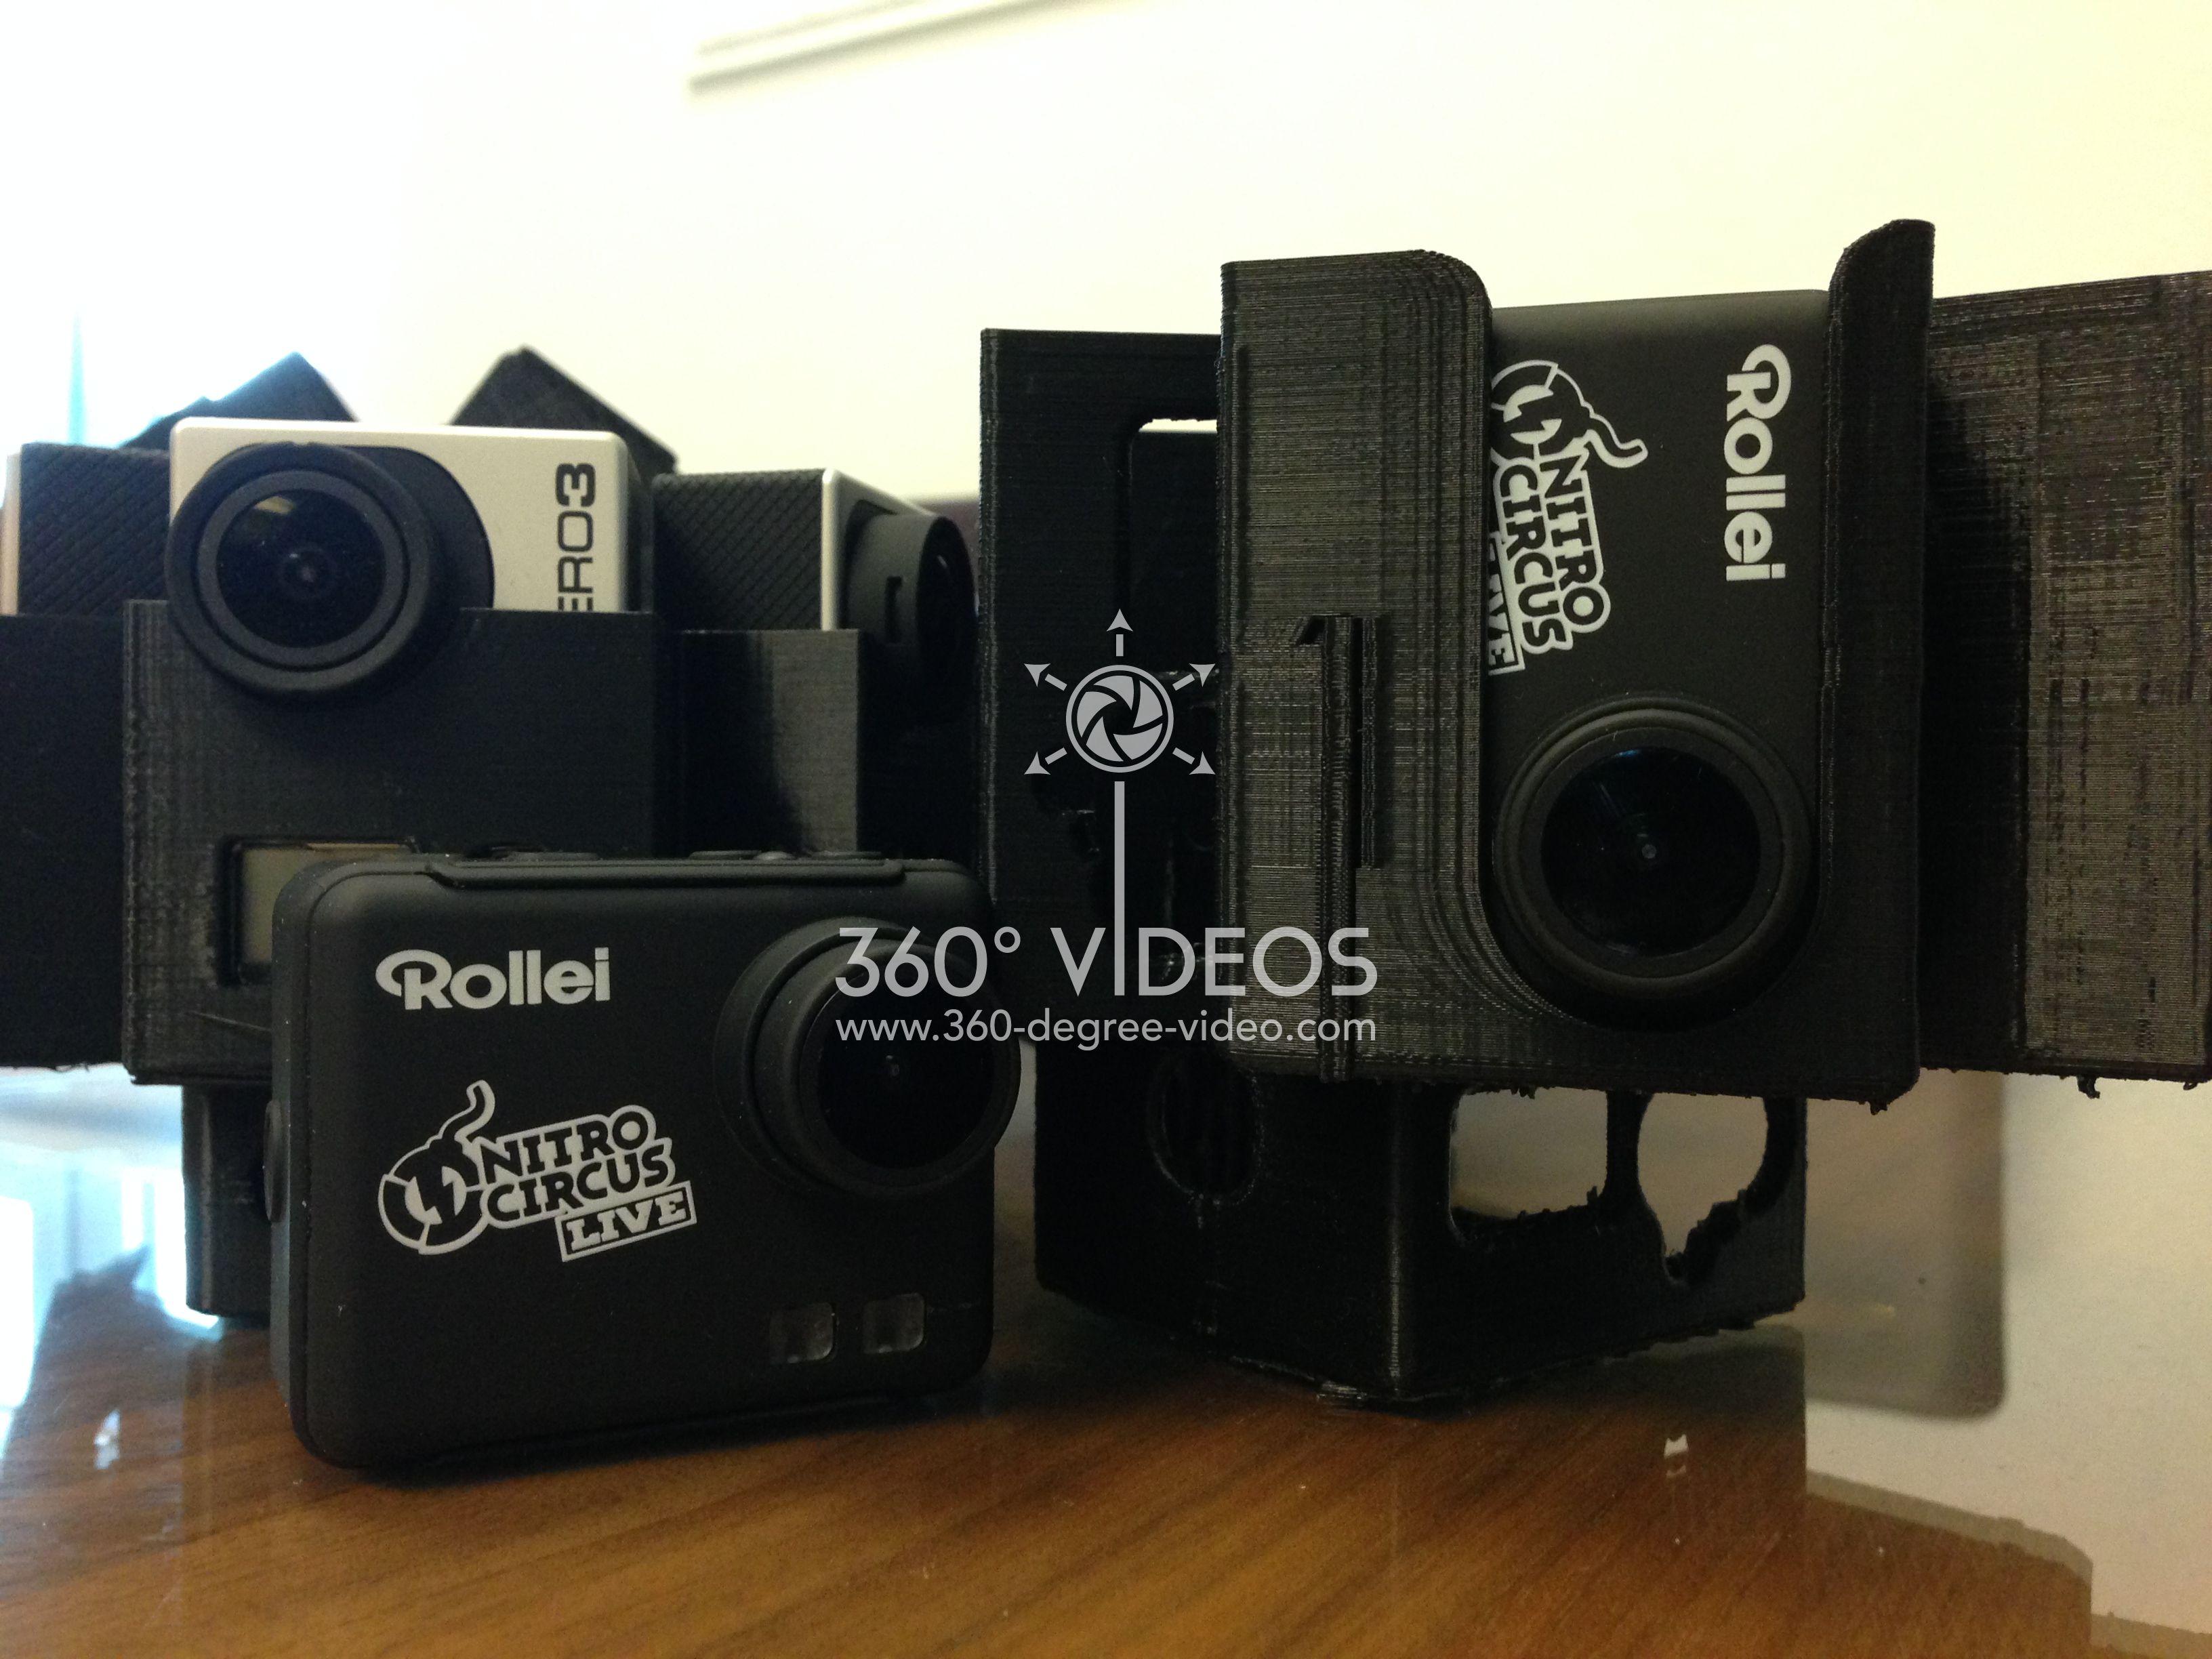 360 degree video mount